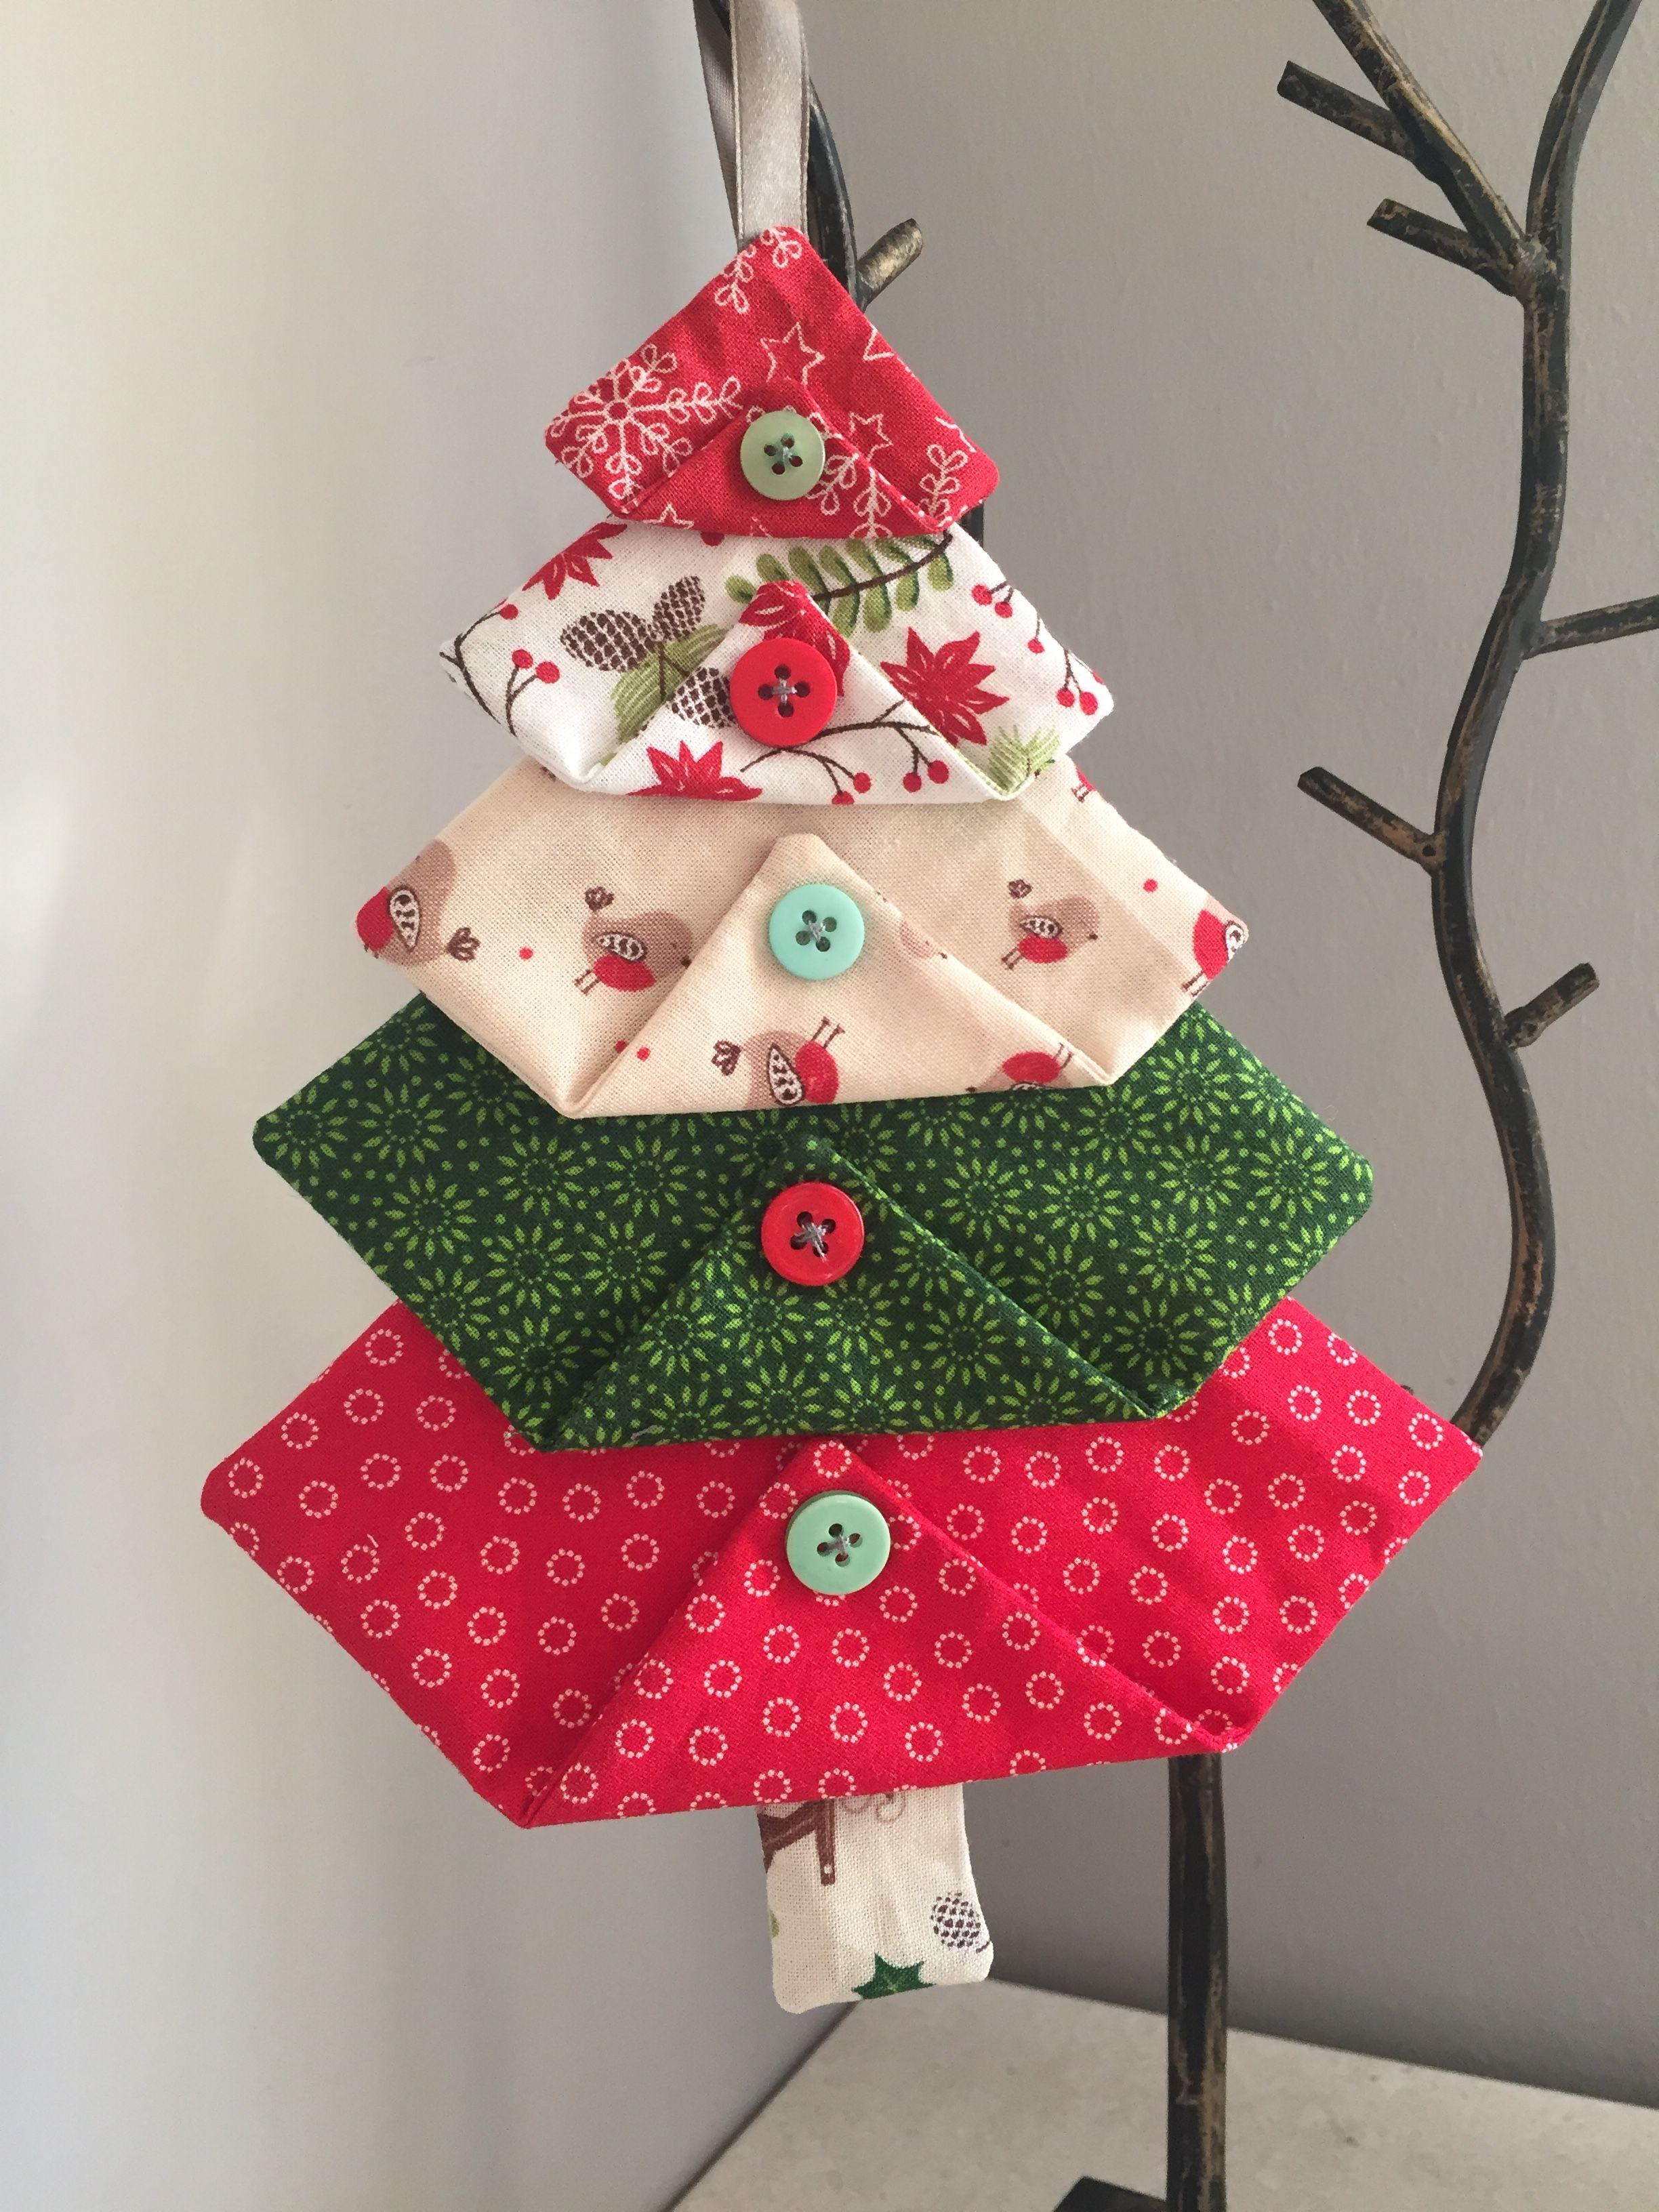 Fabric Christmas Tree Decorations Fabric Christmas Ornaments Fabric Christmas Decorations Fabric Christmas Trees